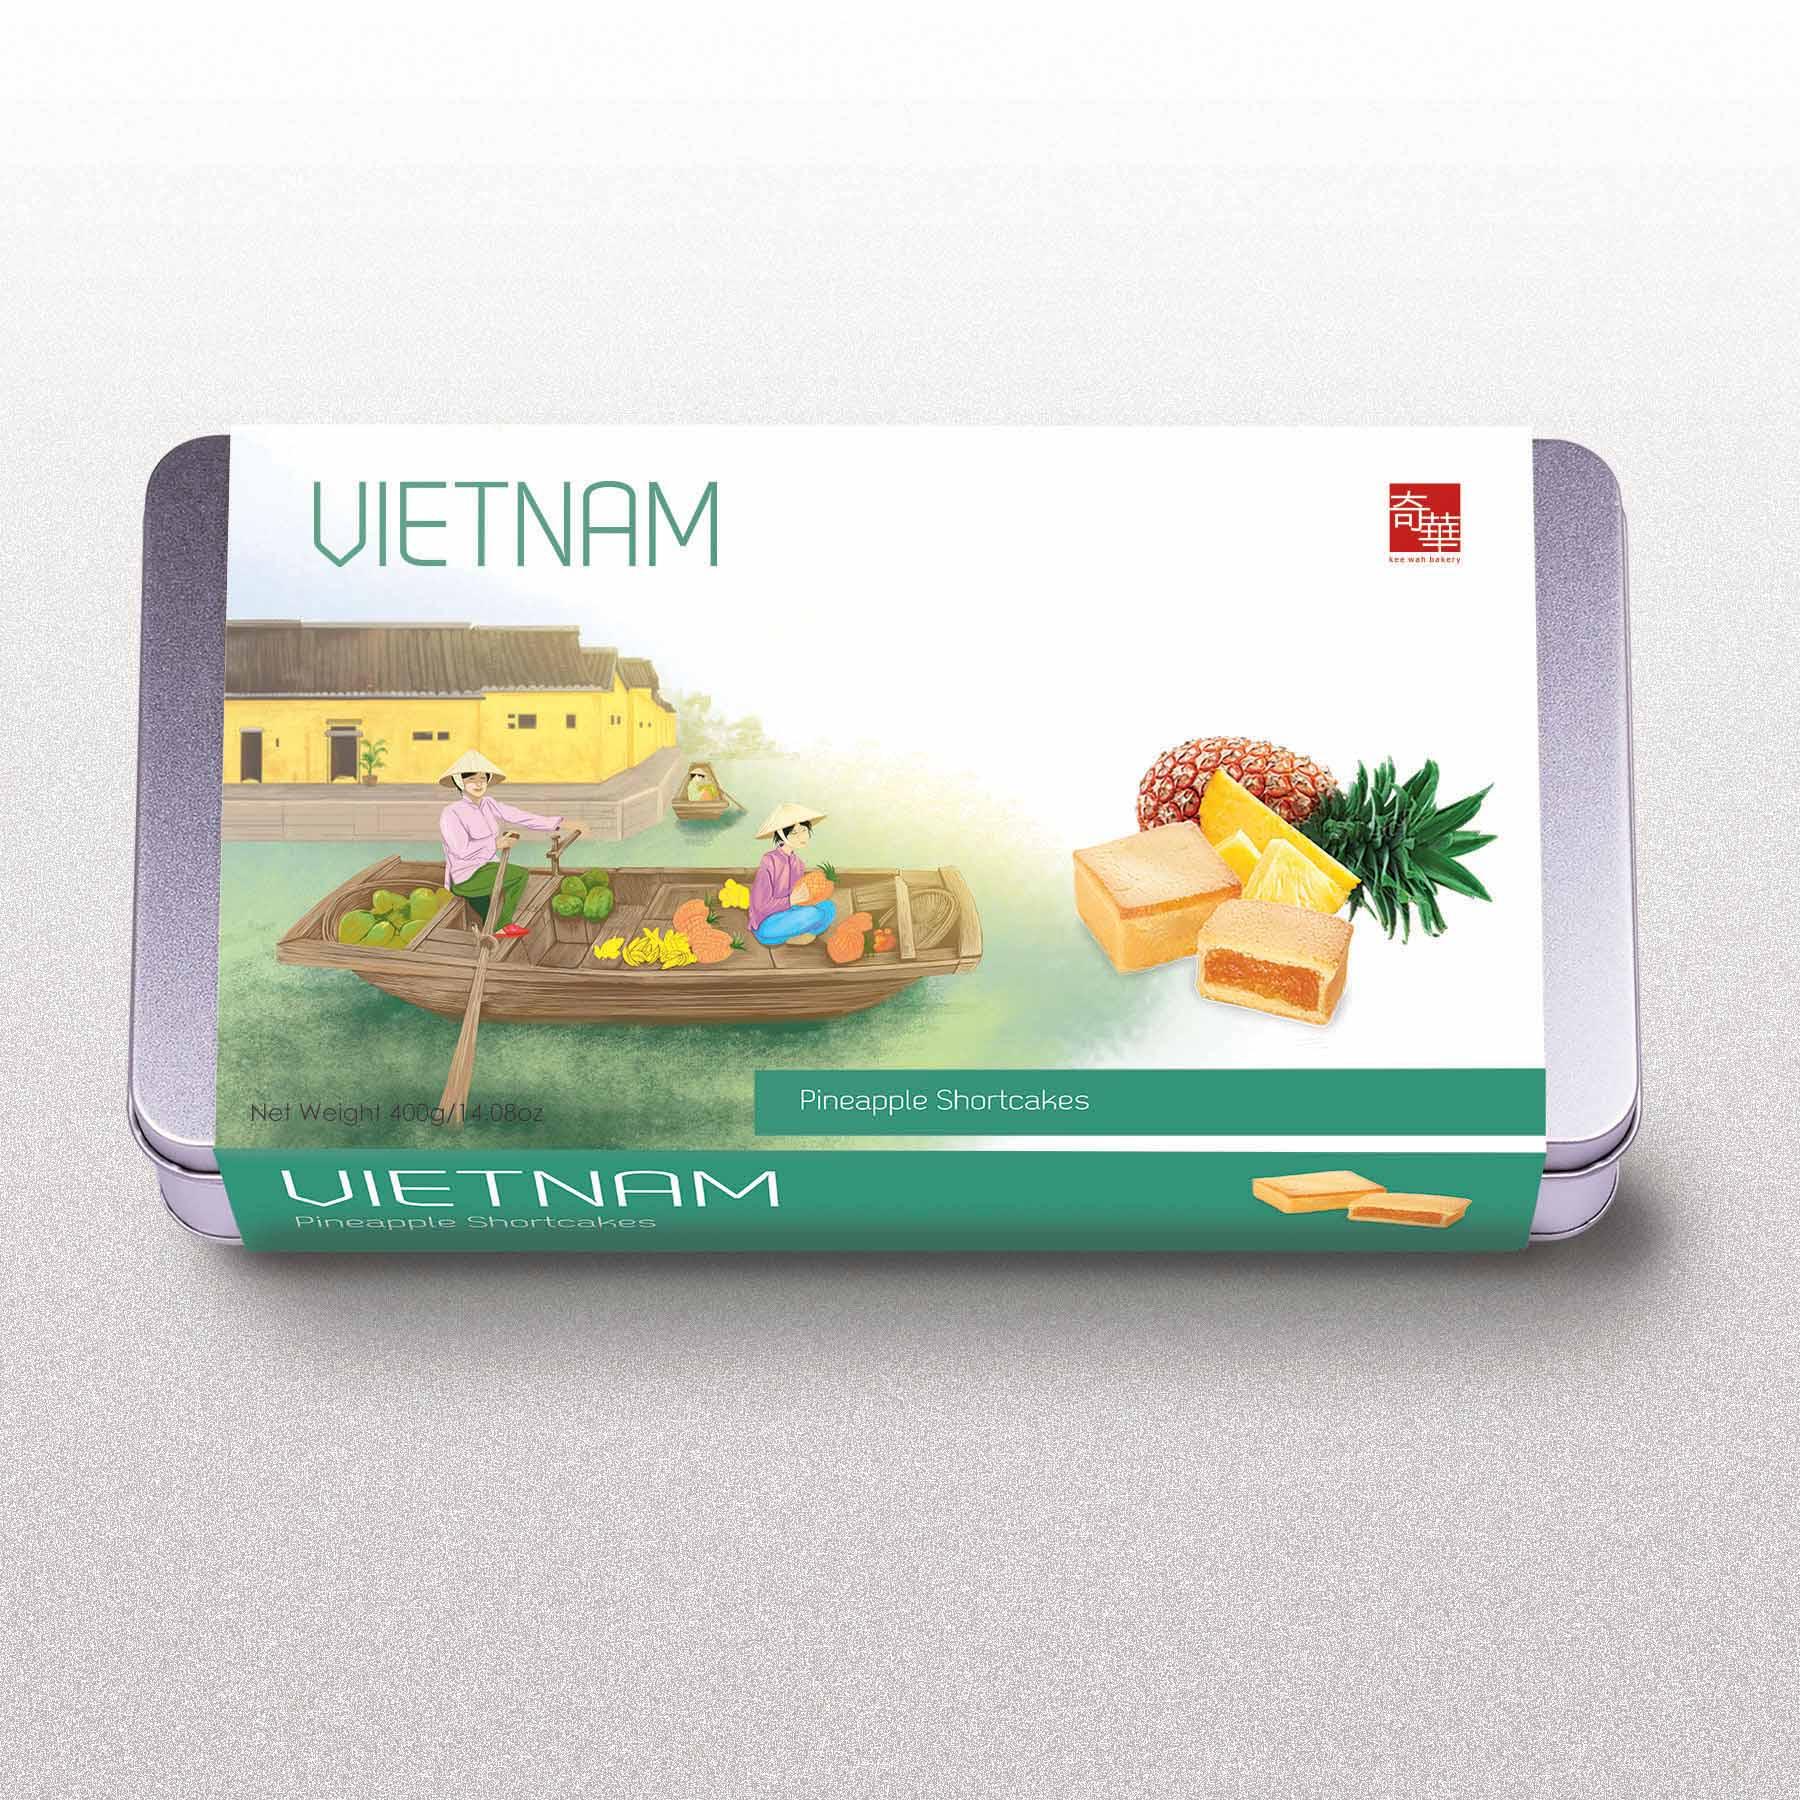 Vietnam Travel Cookie Box for DFS